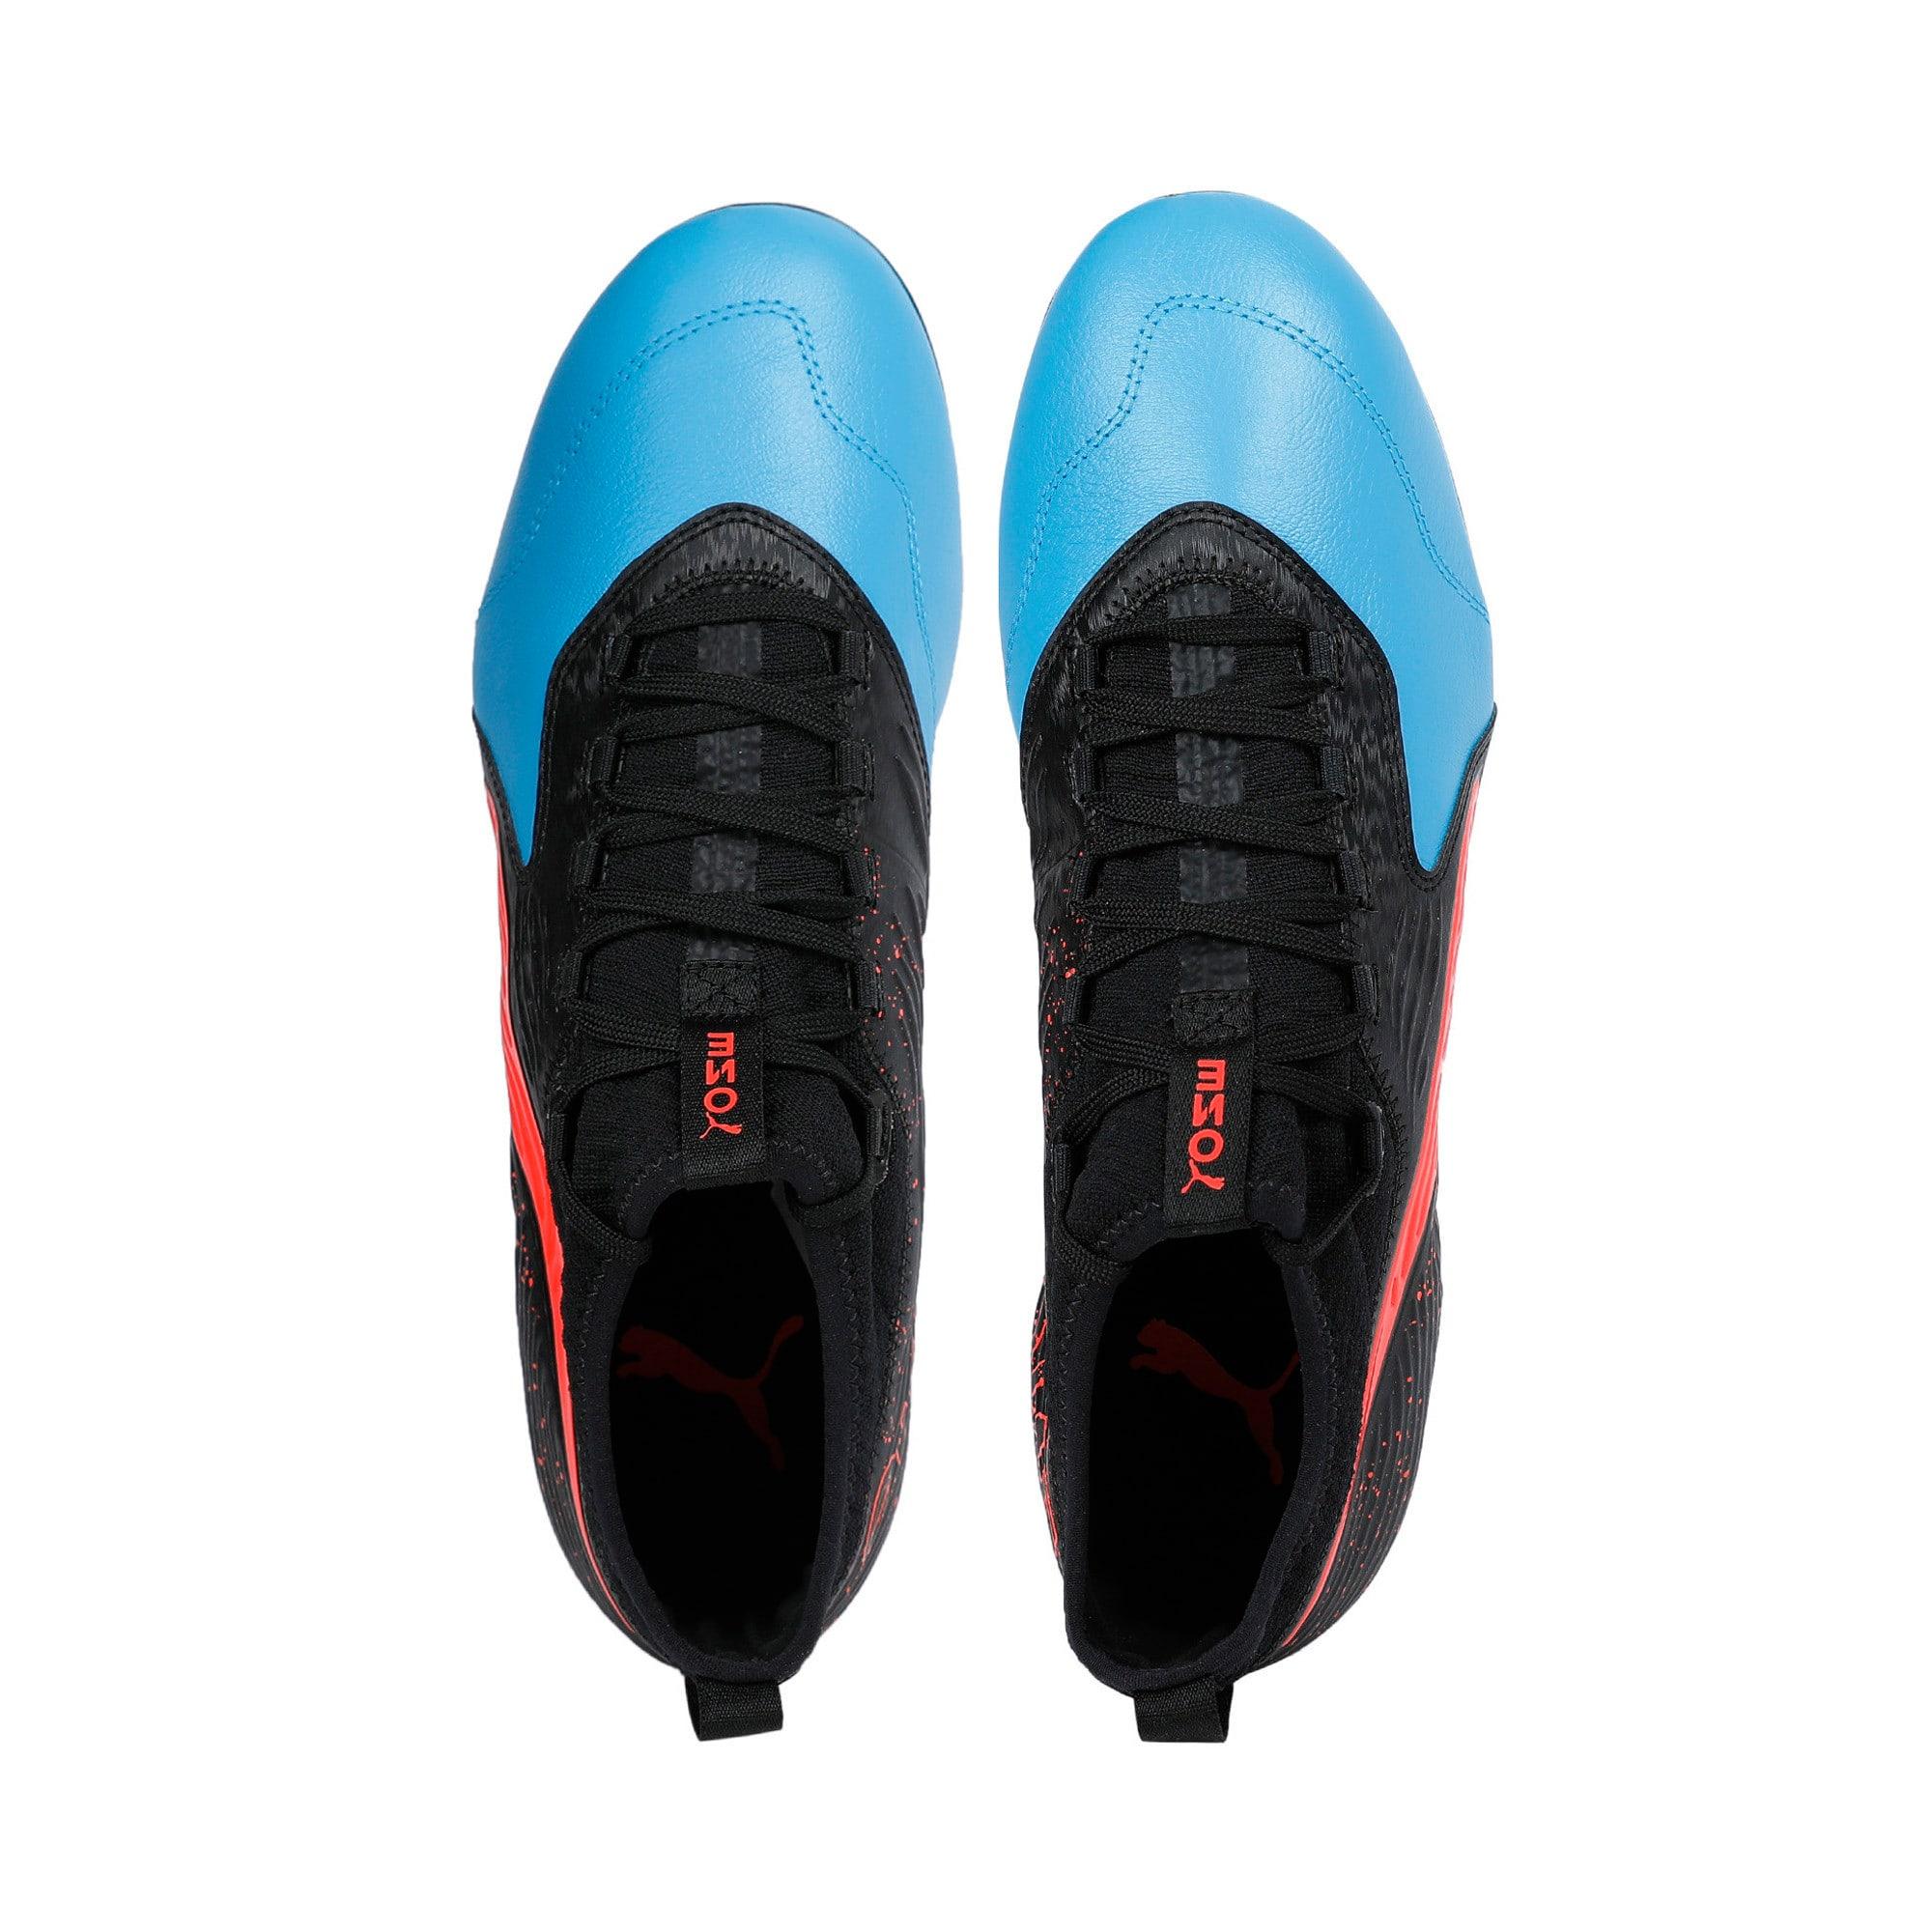 Thumbnail 6 of PUMA ONE 19.3 FG/AG Men's Football Boots, Bleu Azur-Red Blast-Black, medium-IND